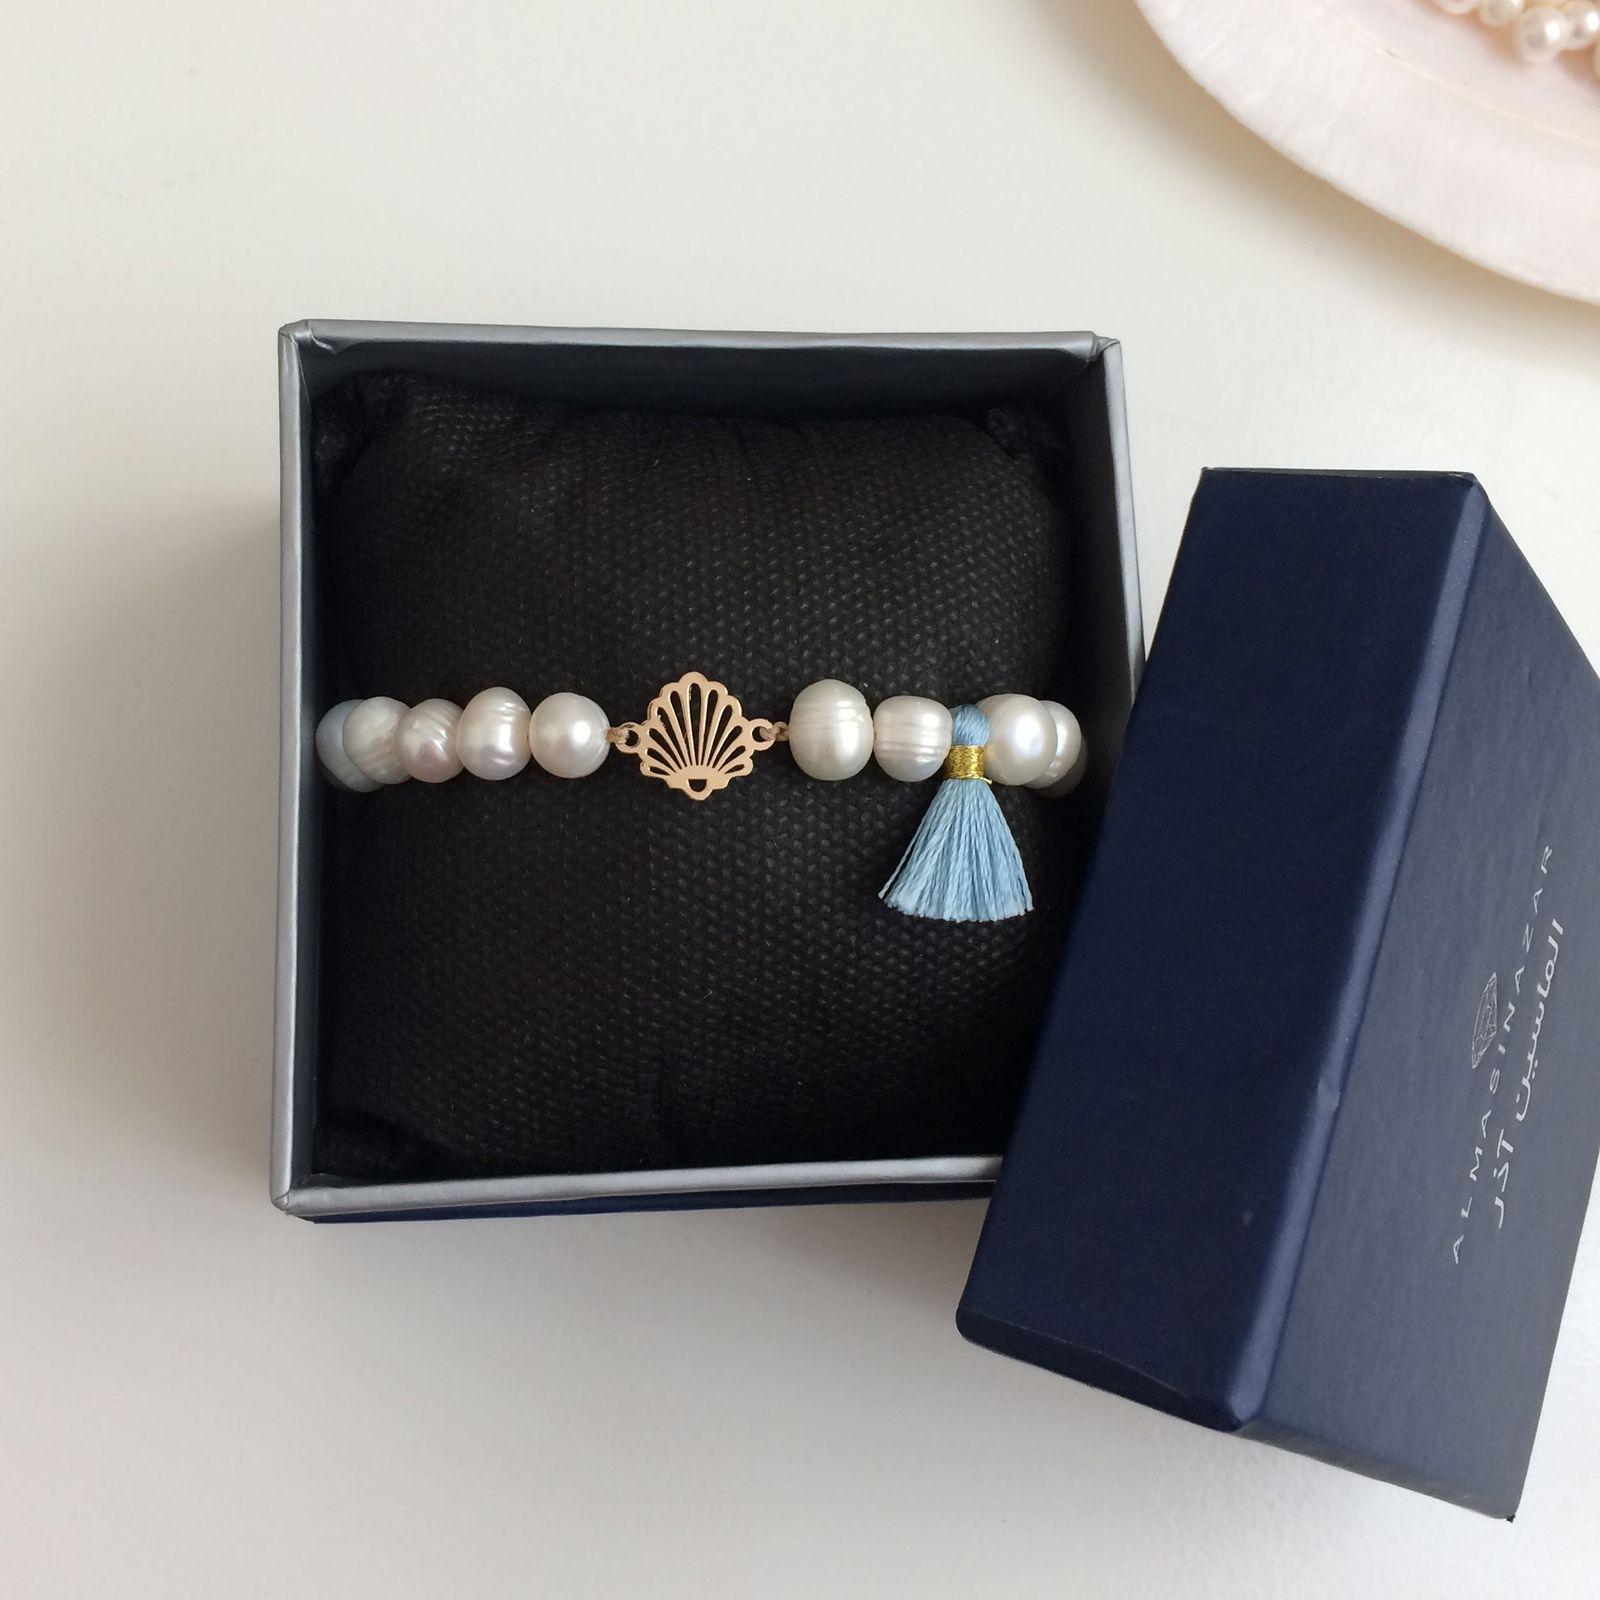 دستبند طلا 18 عیار زنانه الماسین آذر کد SADAF03 -  - 4